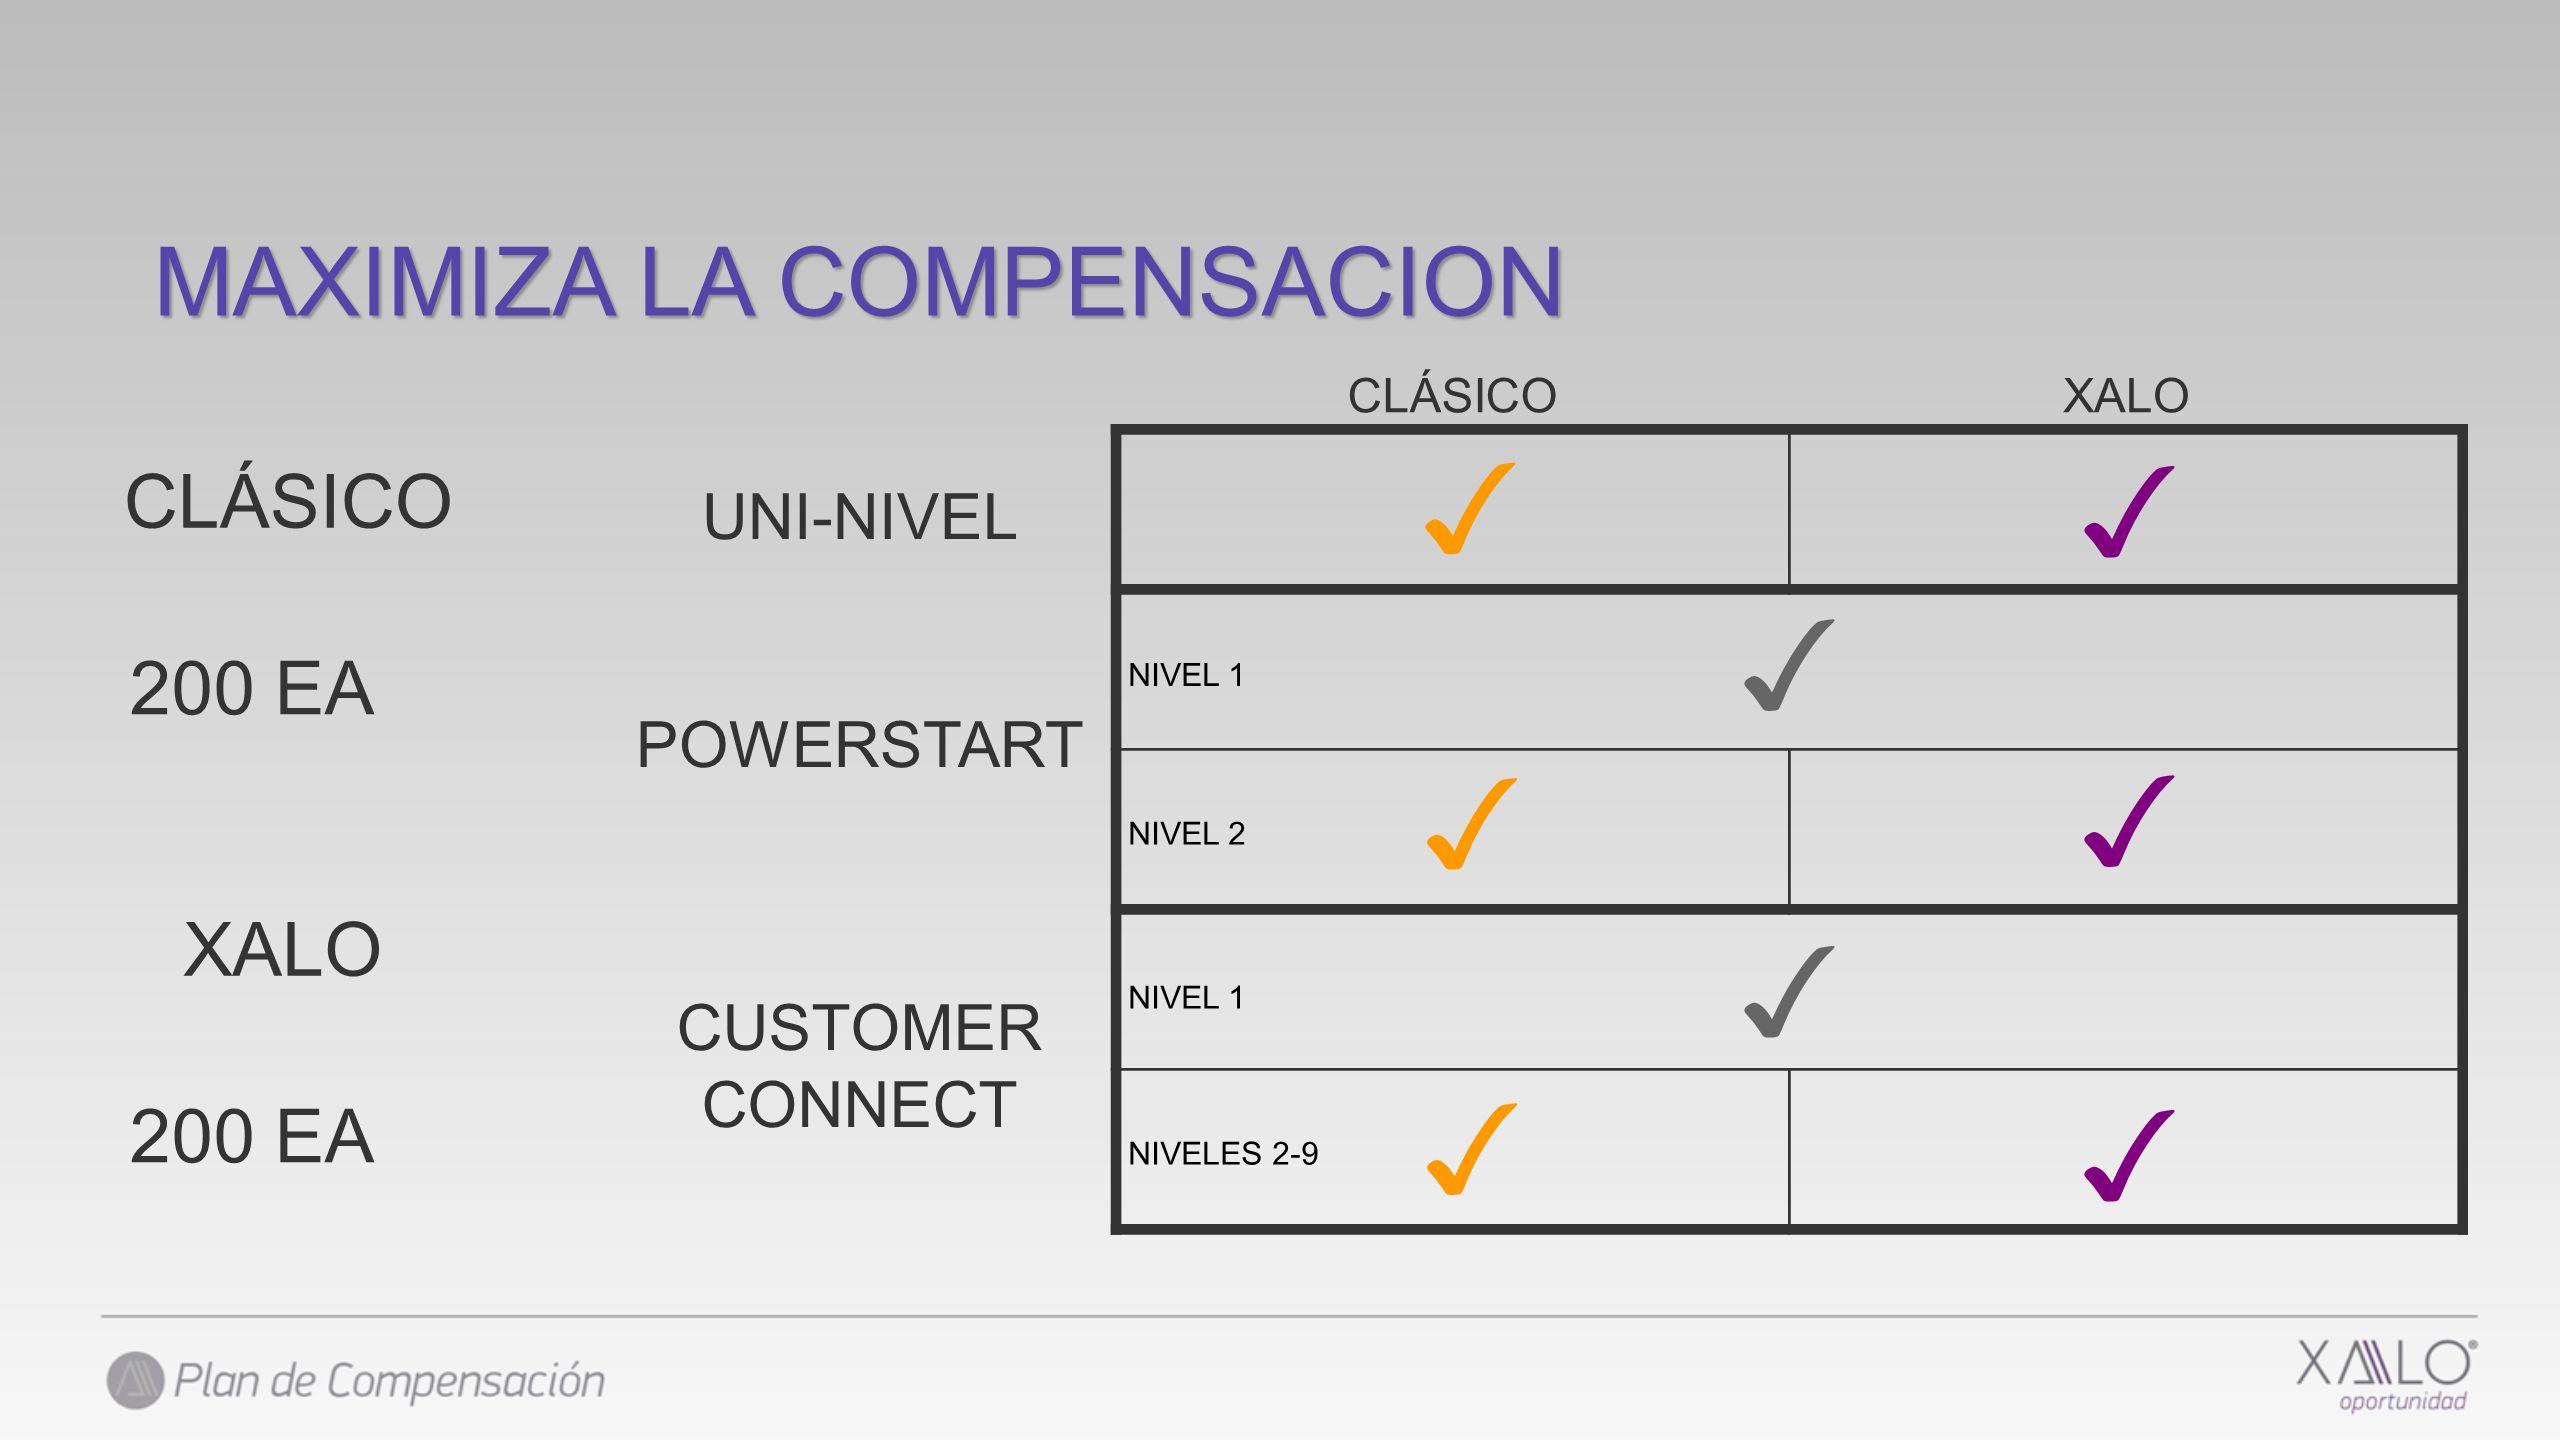 UNI-NIVEL POWERSTART CUSTOMER CONNECT CLÁSICOXALO NIVEL 1 NIVEL 2 NIVEL 1 NIVELES 2-9 200 EA CLÁSICO 200 EA XALO MAXIMIZA LA COMPENSACION